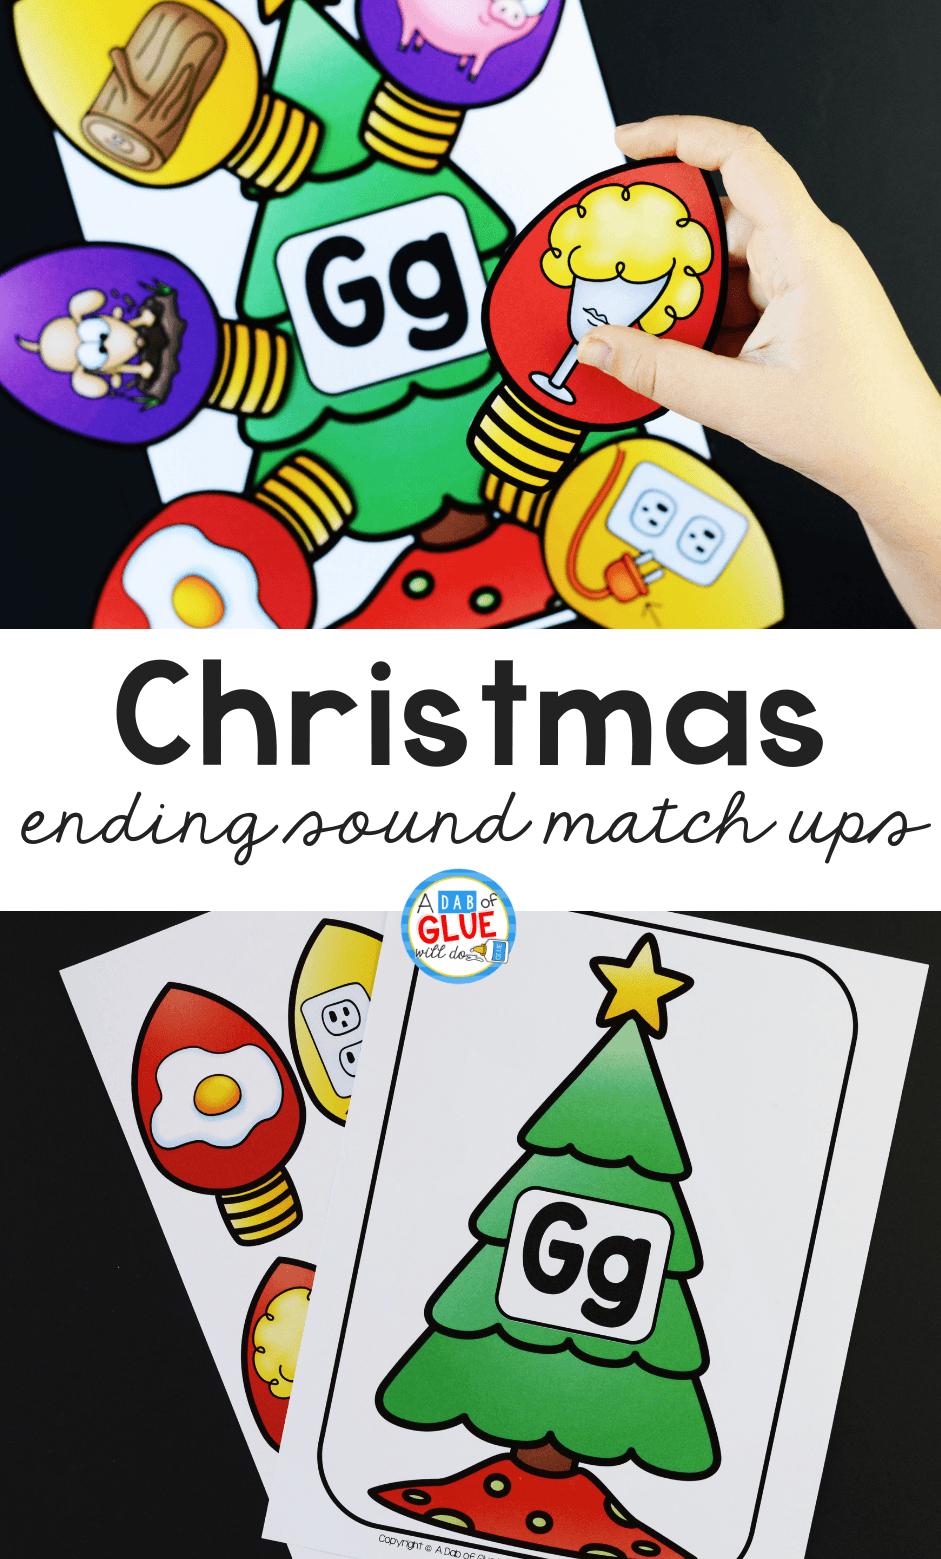 Christmas Ending Sound Match Up A Dab Of Glue Will Do Christmas Kindergarten Preschool Christmas Activities Creative Activities For Kids [ 1559 x 941 Pixel ]